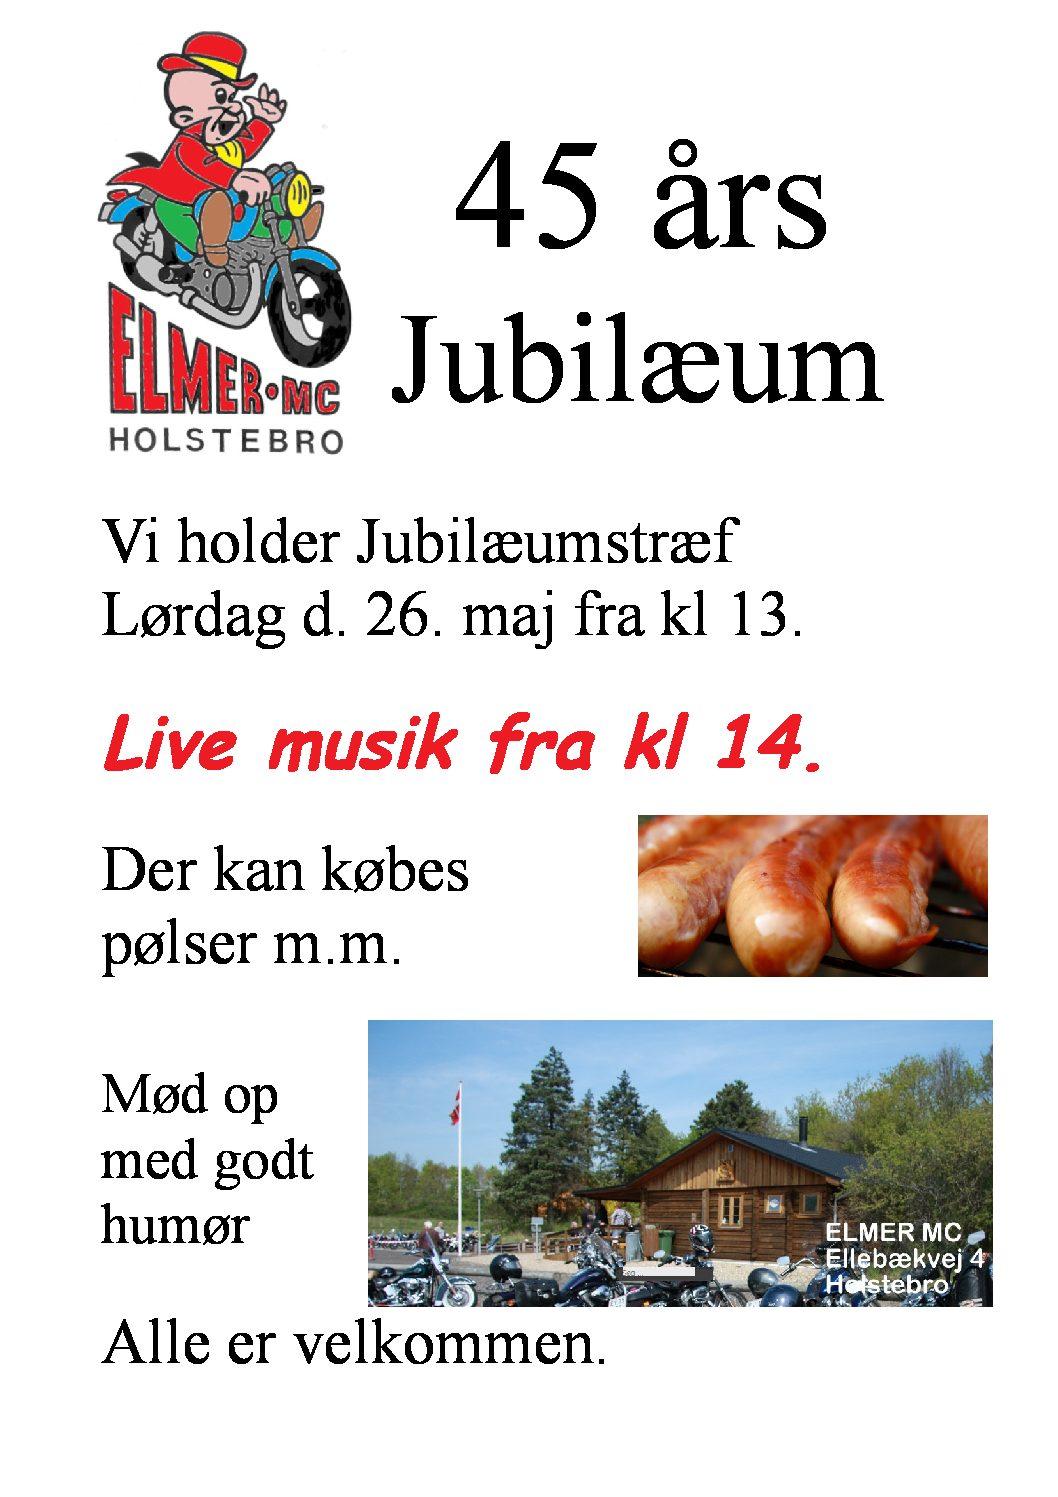 Elmer MC i Holstebro holder 45 års jubilæum.